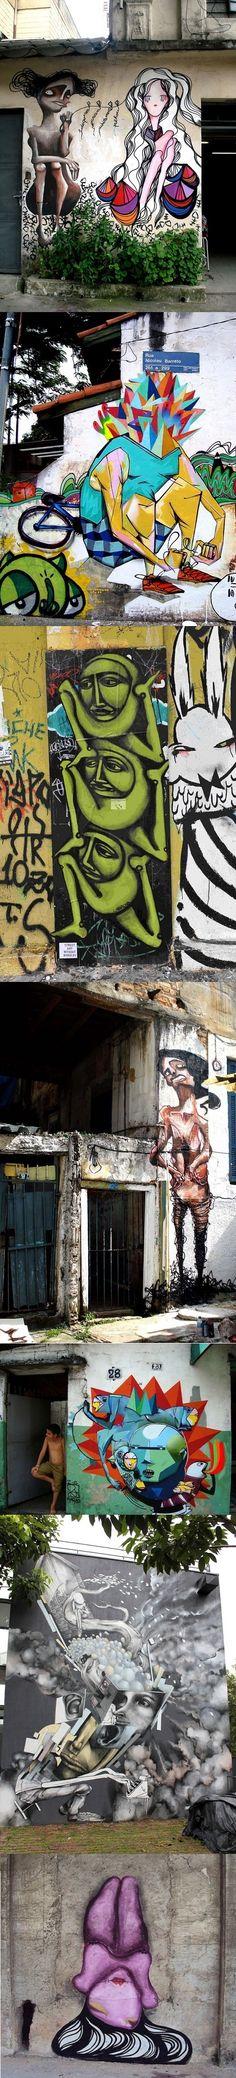 Street Art, Sao Paolo Brazil